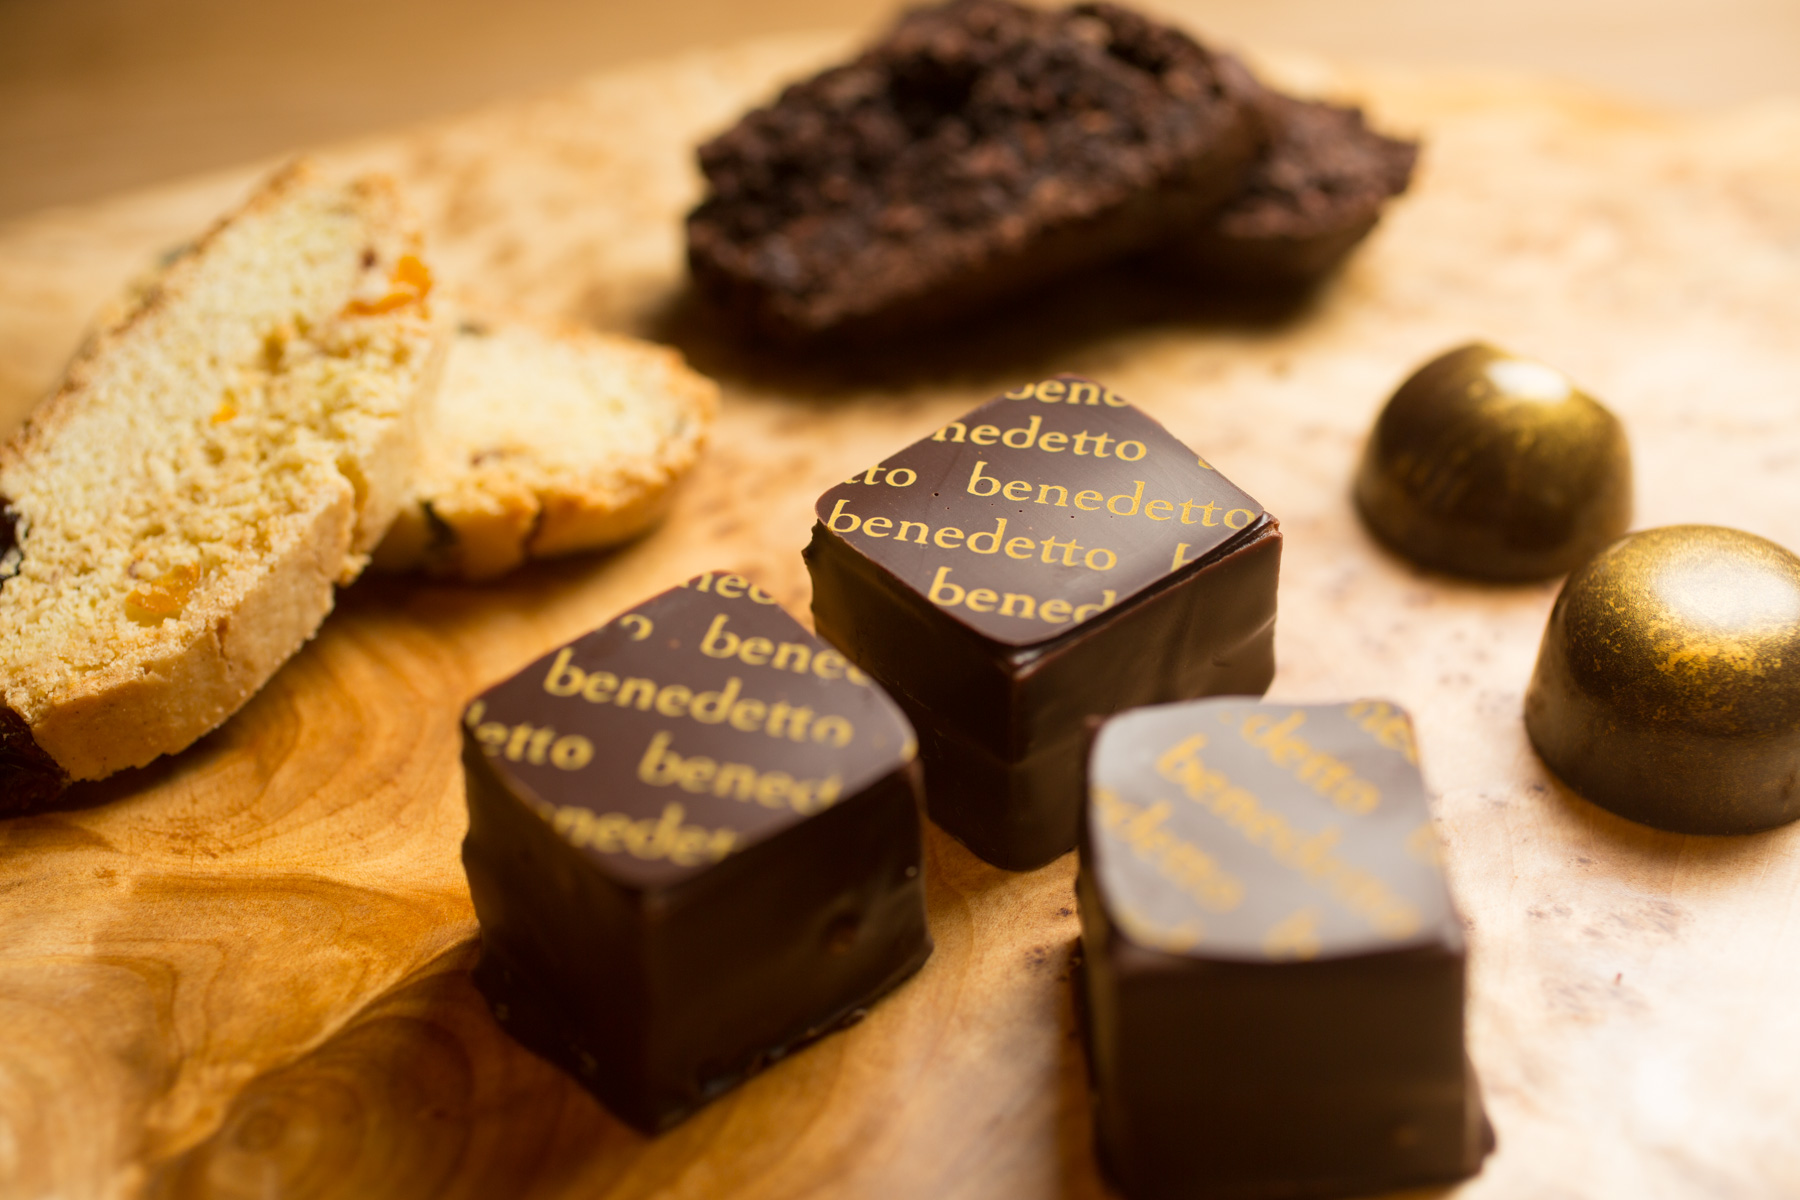 gormet-chocolate-benedetto